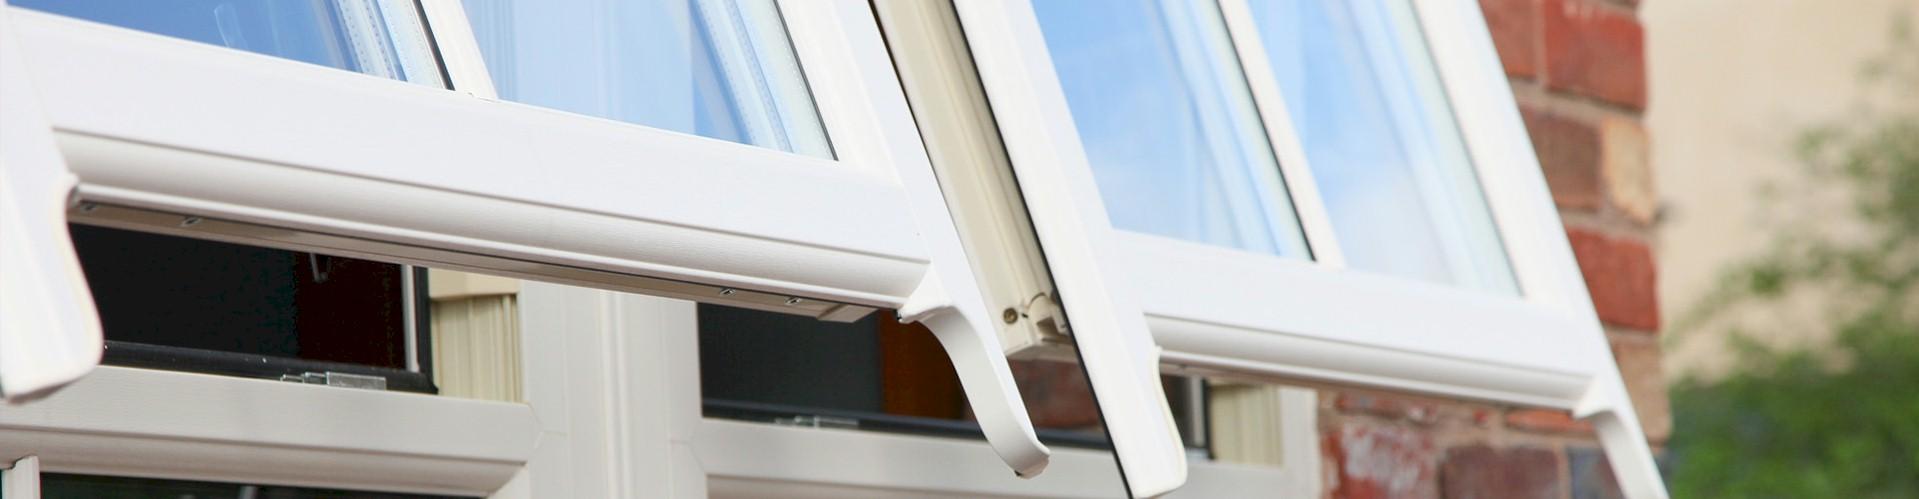 Manufacturer of upvc plastic double glazed casement for Upvc window manufacturers